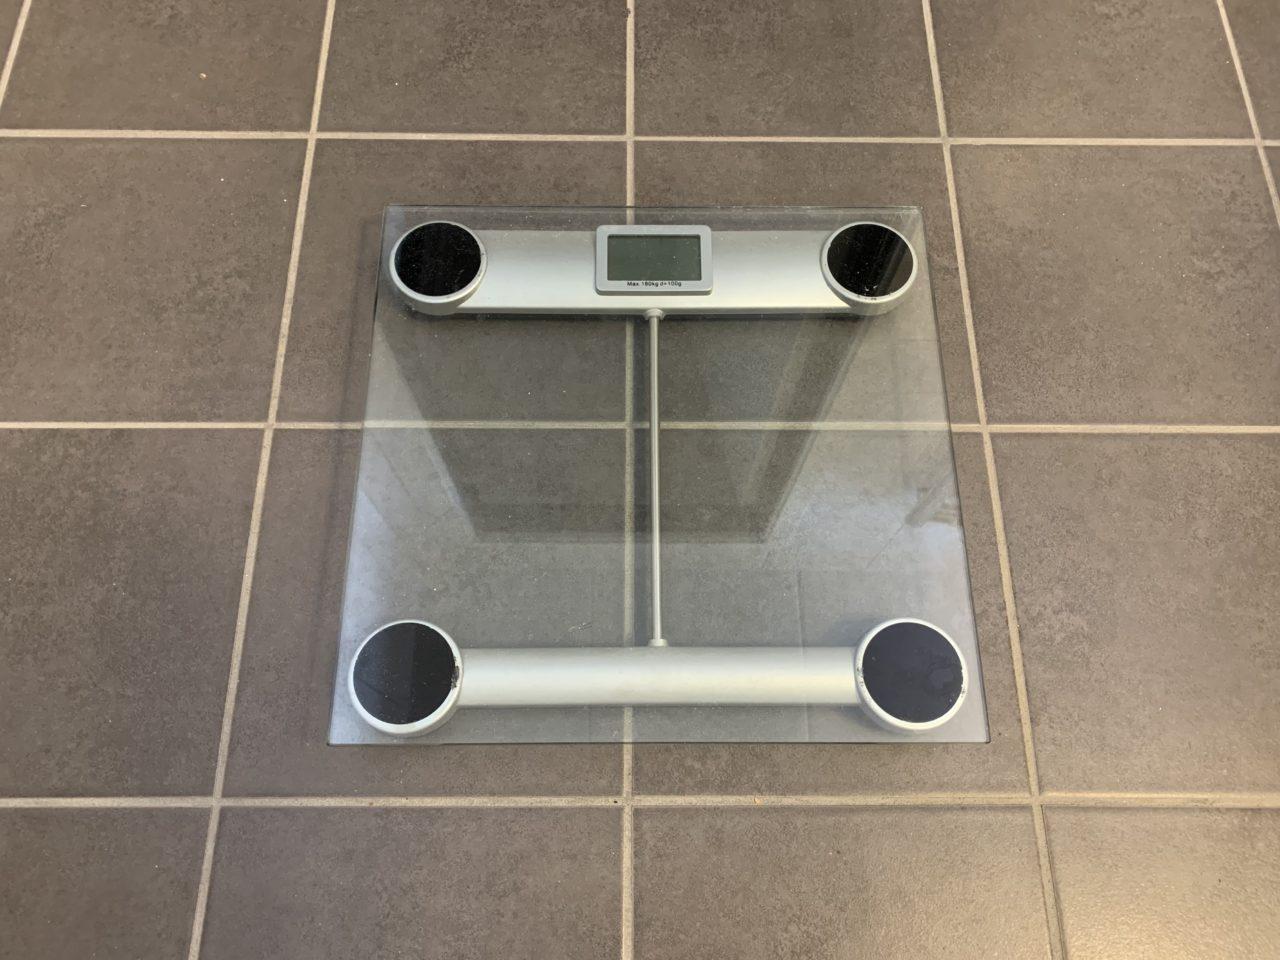 Glass Weight Scale On Bathroom Floor